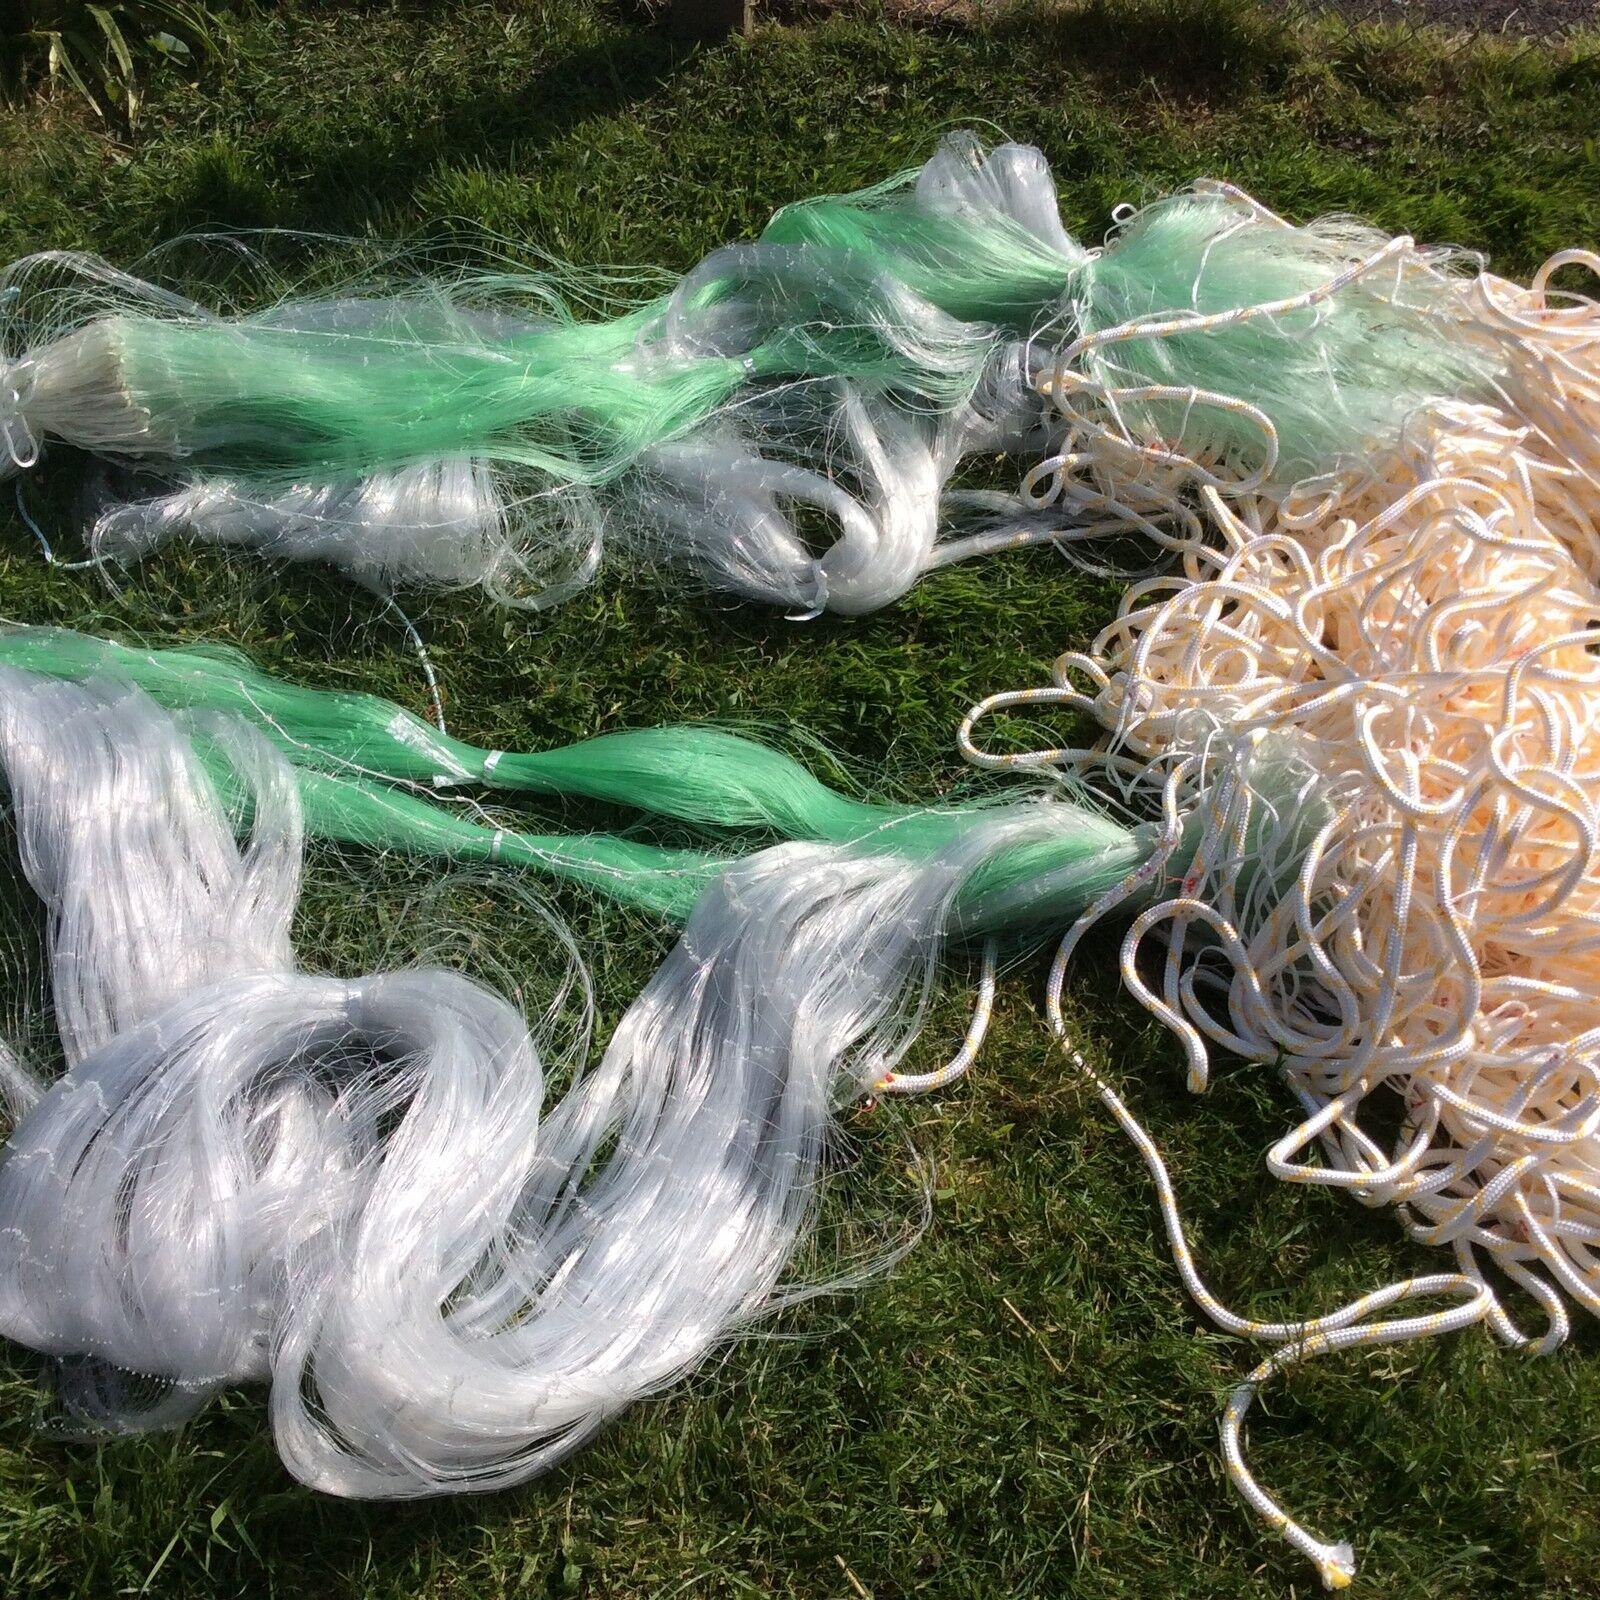 300 ft trammel net, plaice, sole s  monkfish, pollock ect